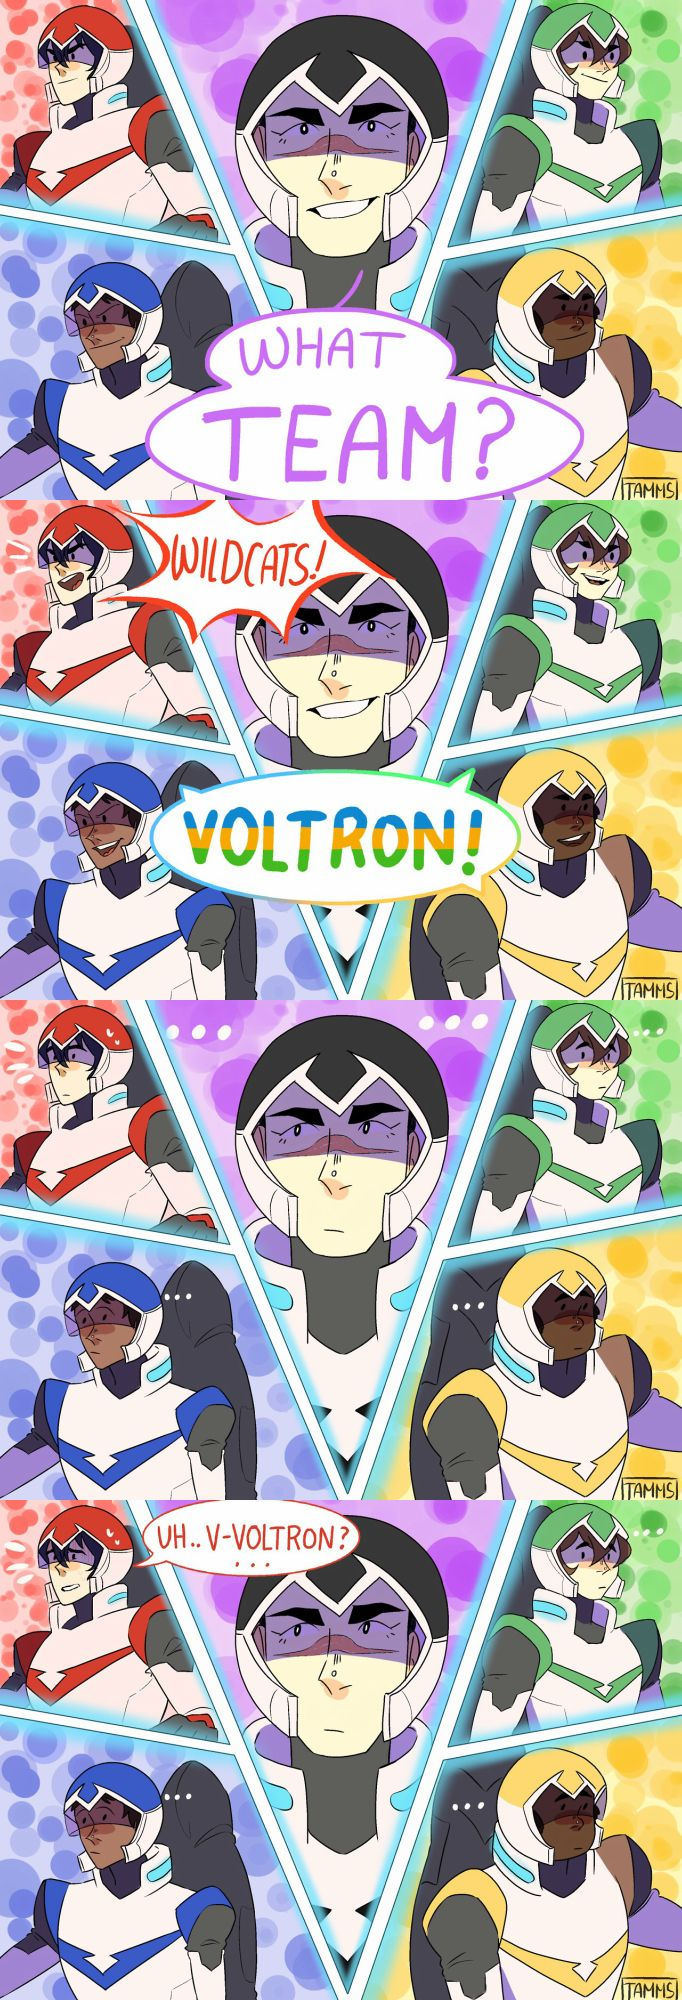 Voltron: Legendary Defender **fulltimedoodler**